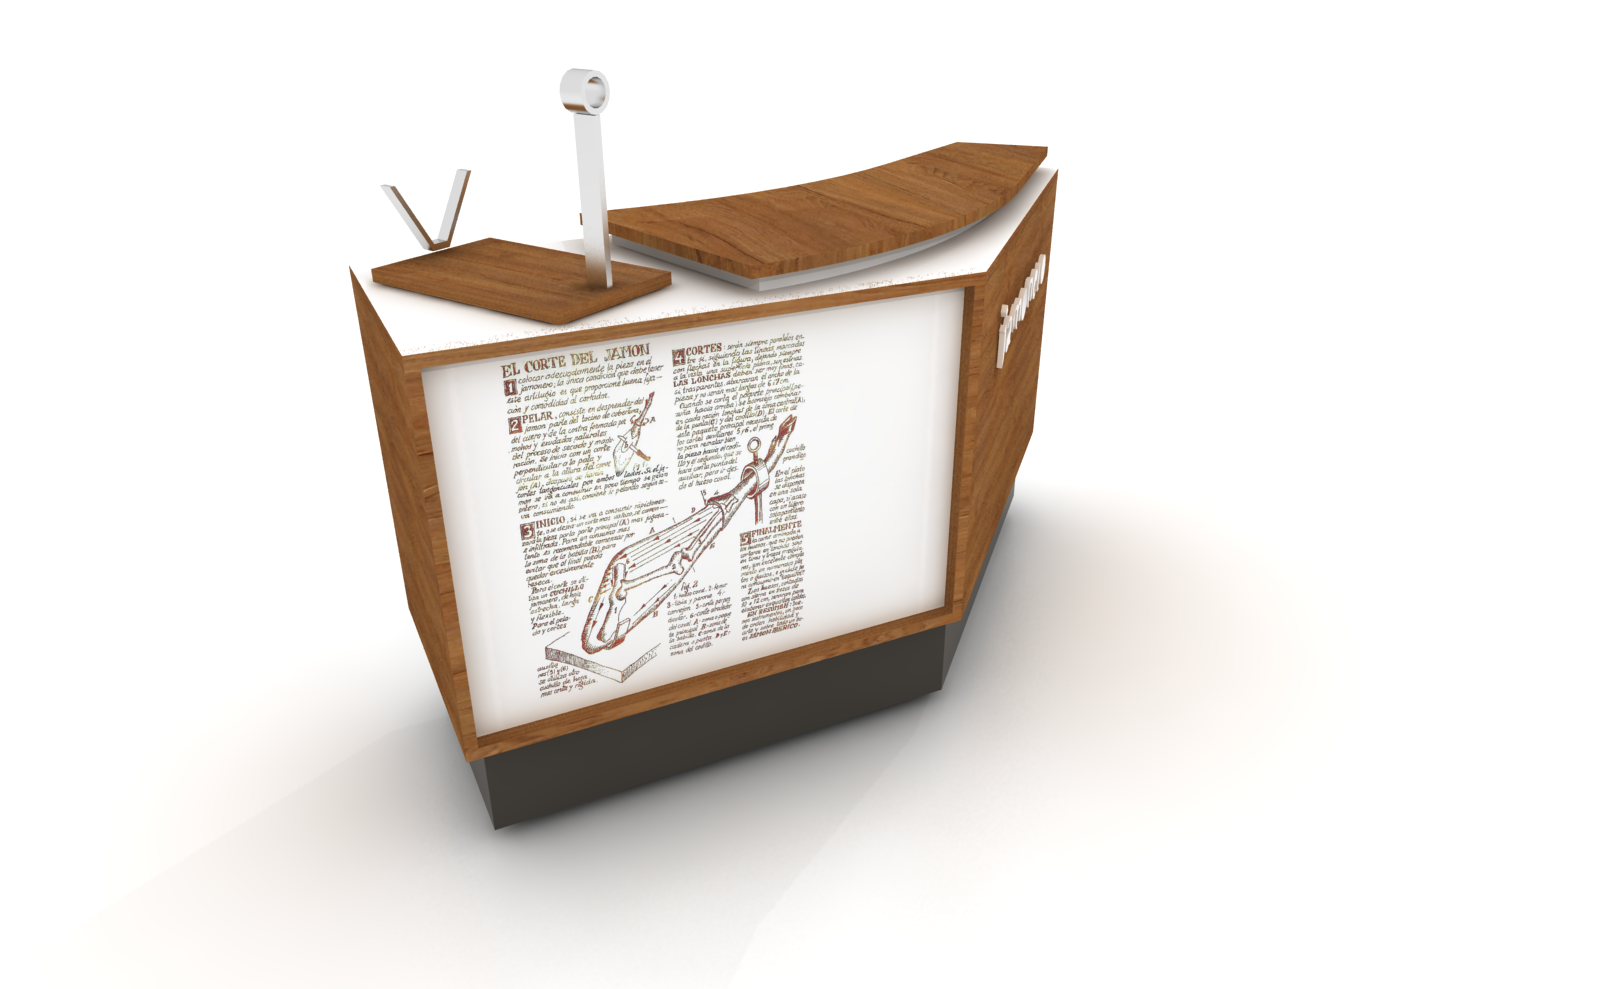 Detalle constructivo mueble